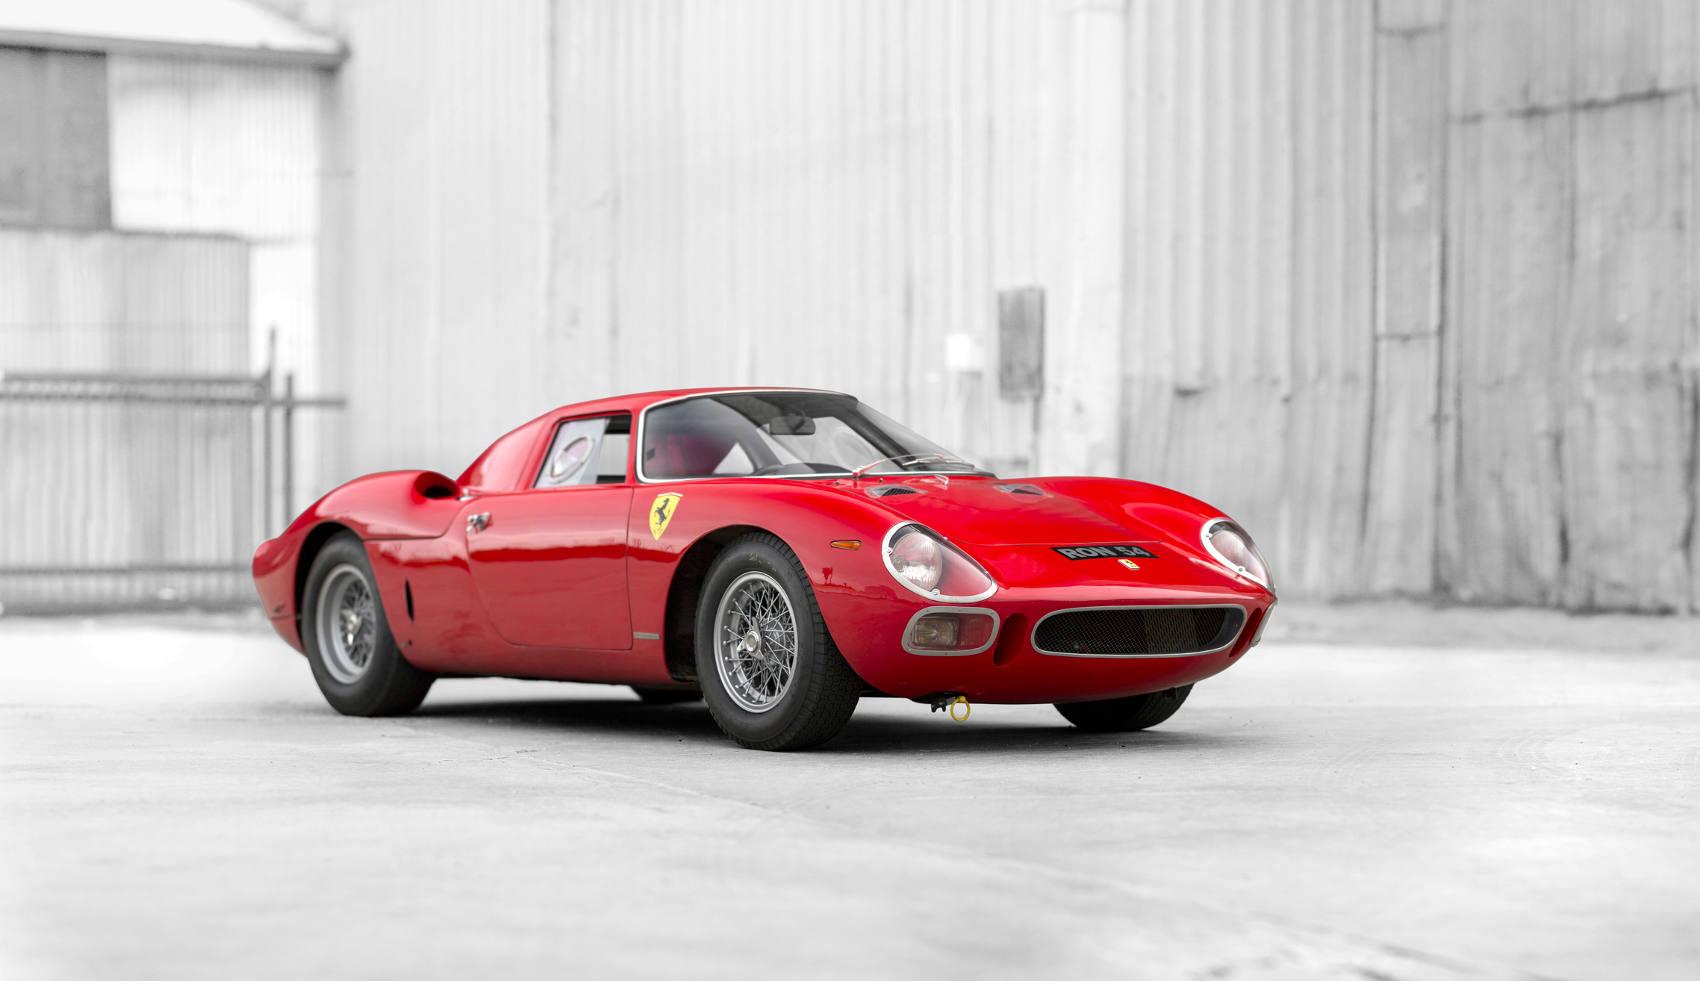 RM - 1964 Ferrari 250 LM by Scaglietti